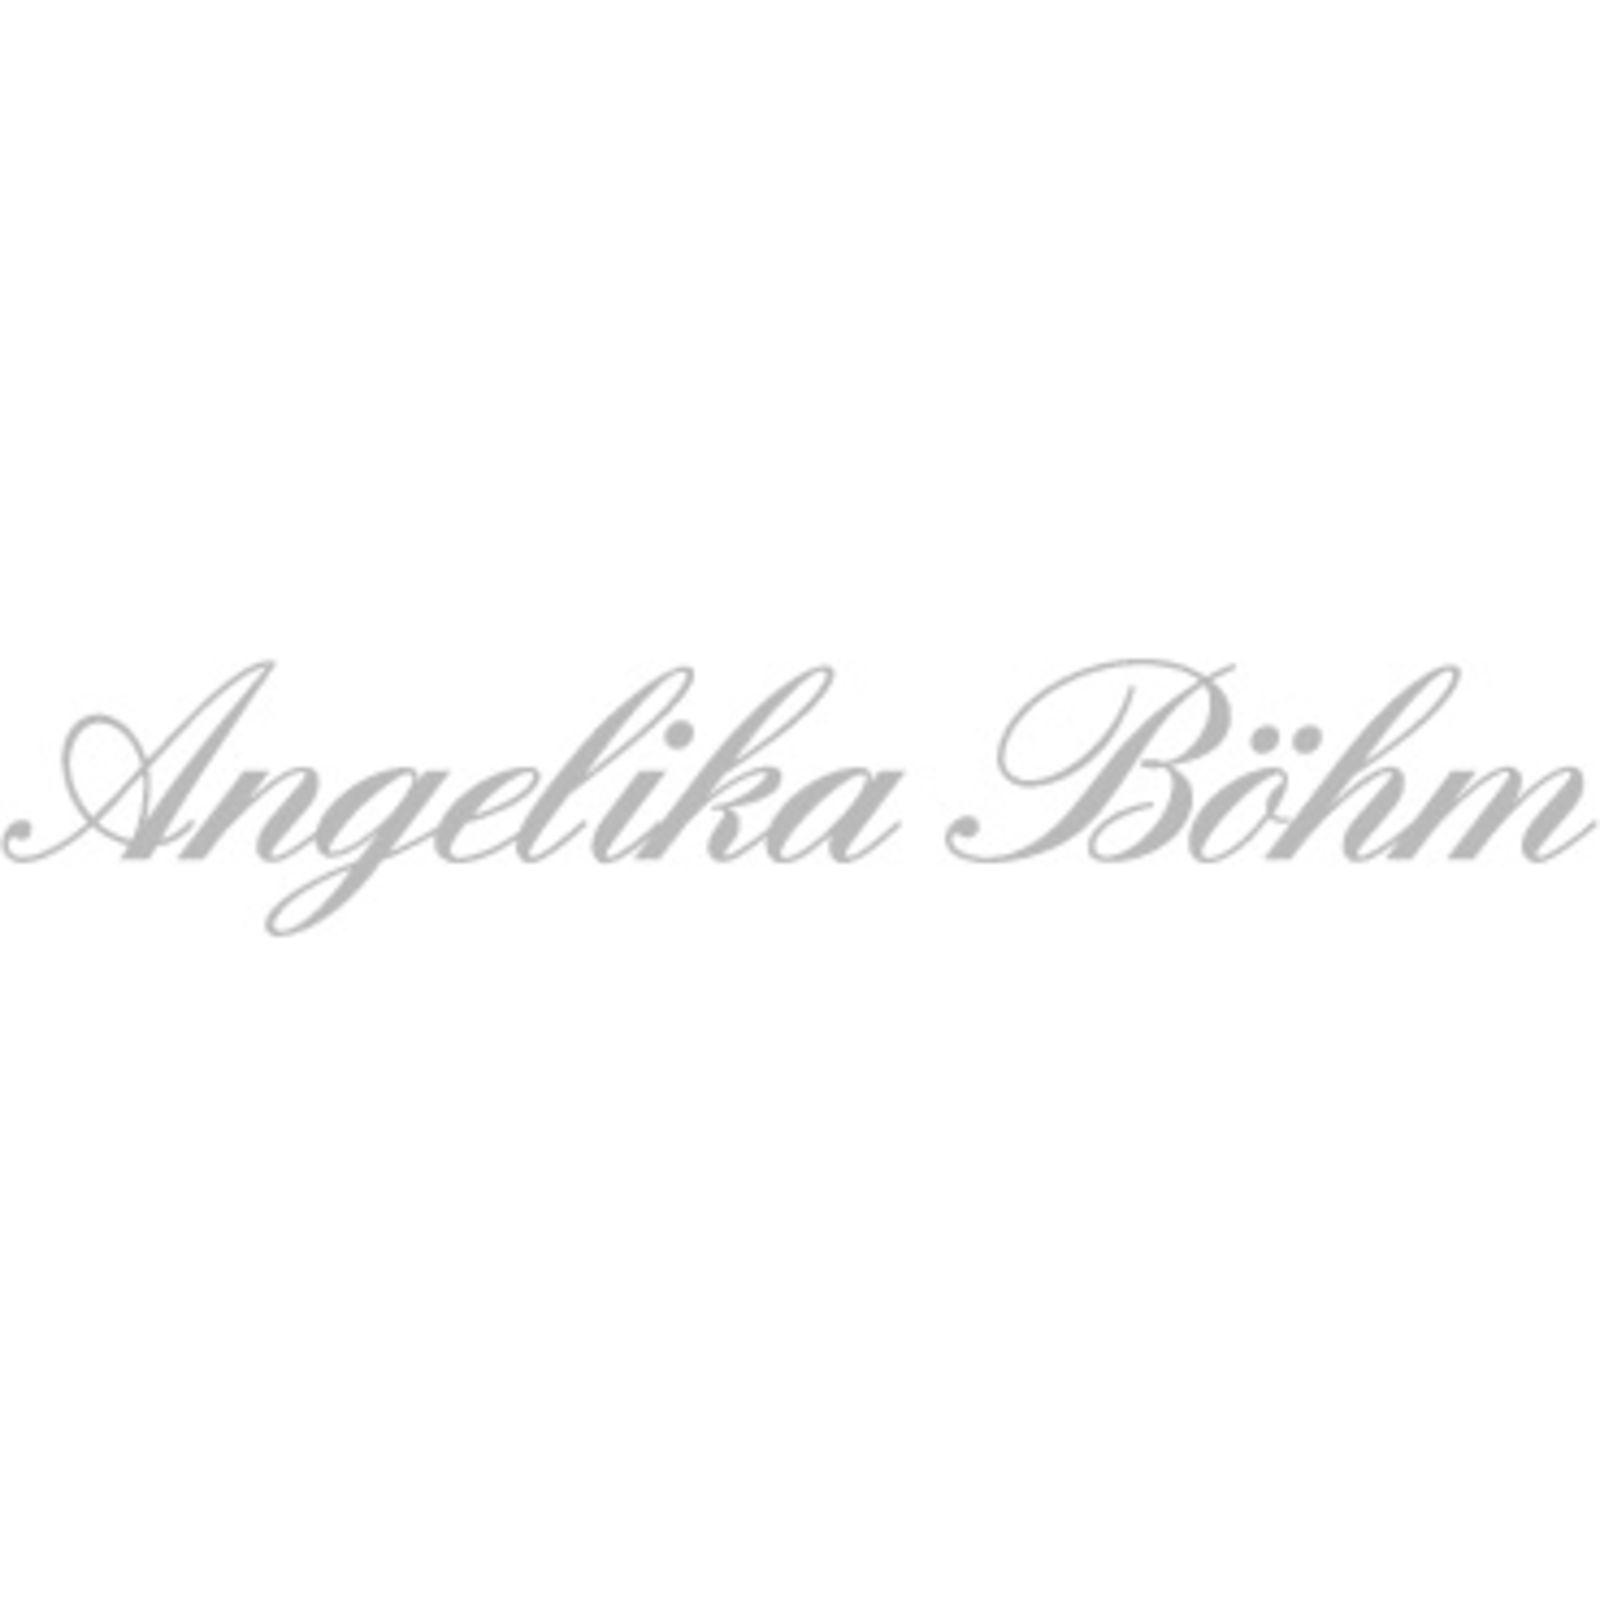 Angelika Böhm